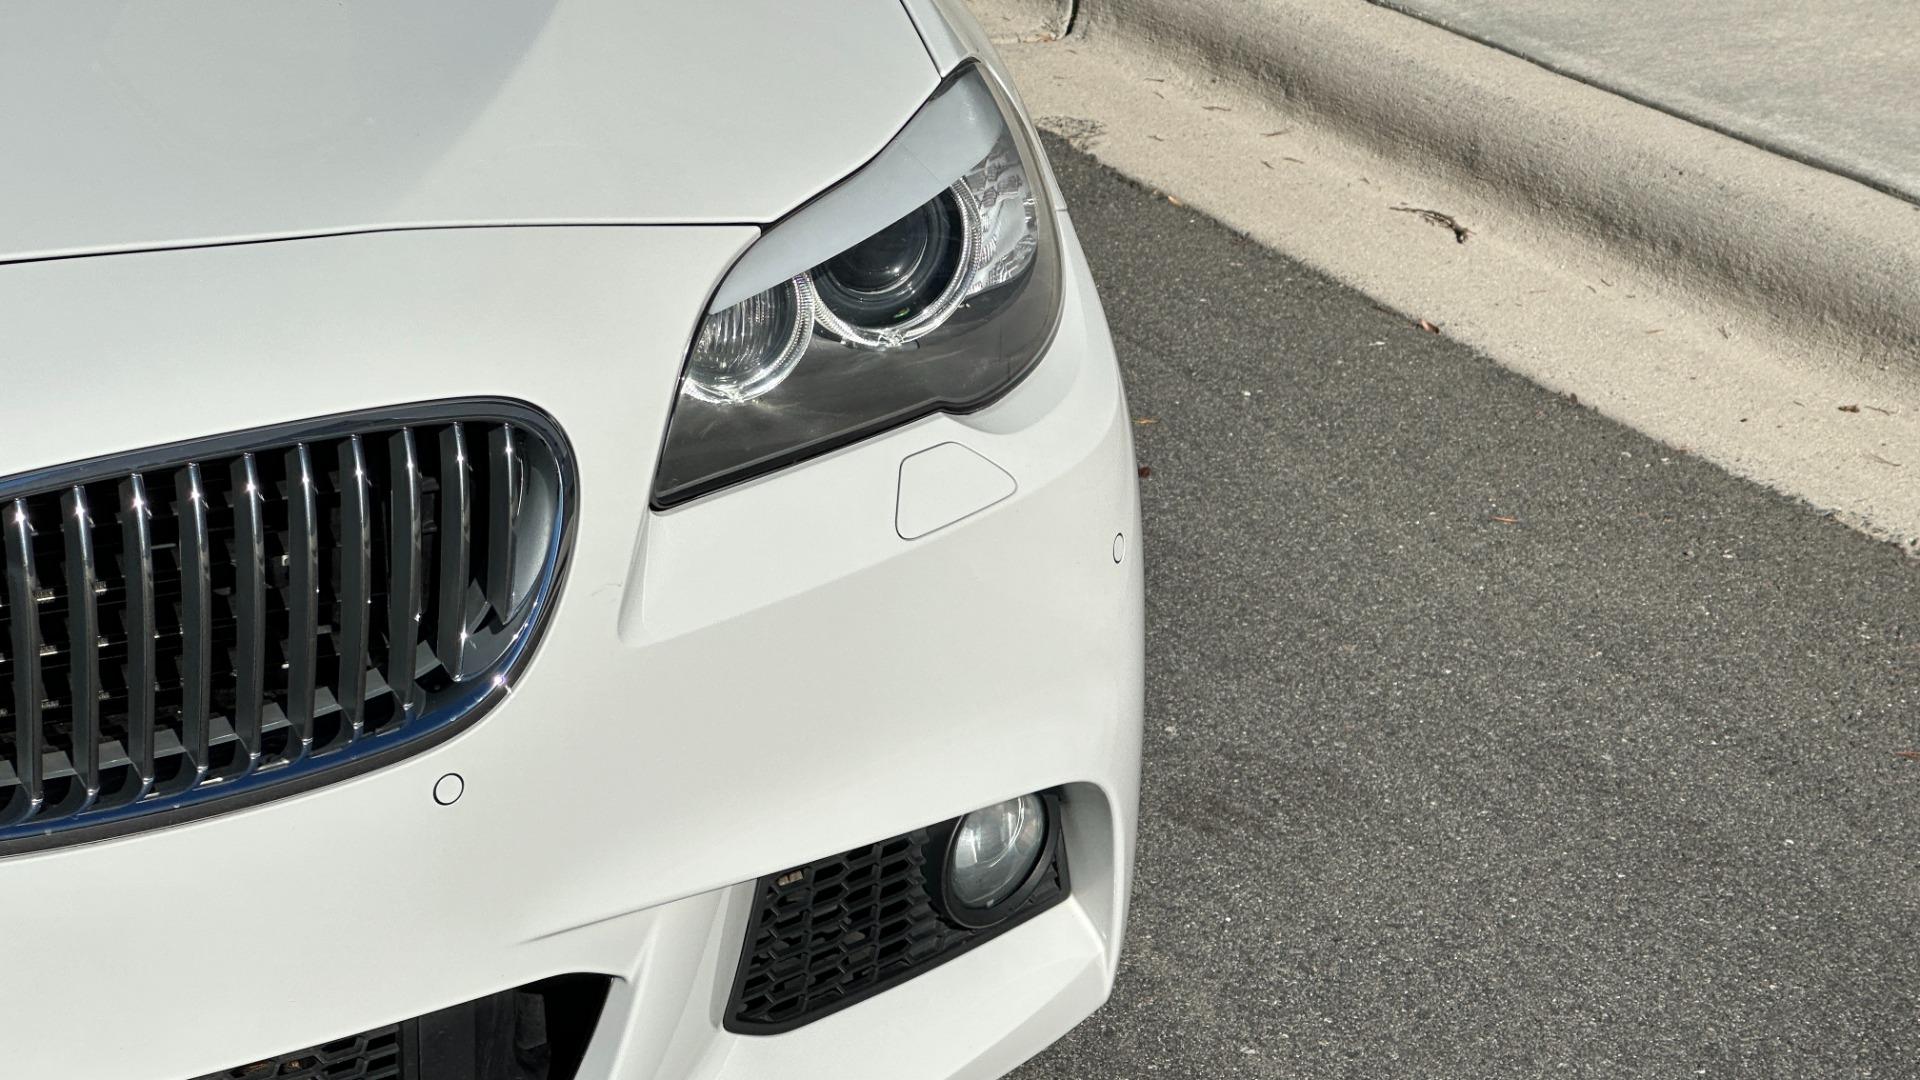 Used 2012 BMW 5 SERIES 550I M SPORT / NAV / CONV PKG / SUNROOF / PREM SND / REARVIEW for sale Sold at Formula Imports in Charlotte NC 28227 73